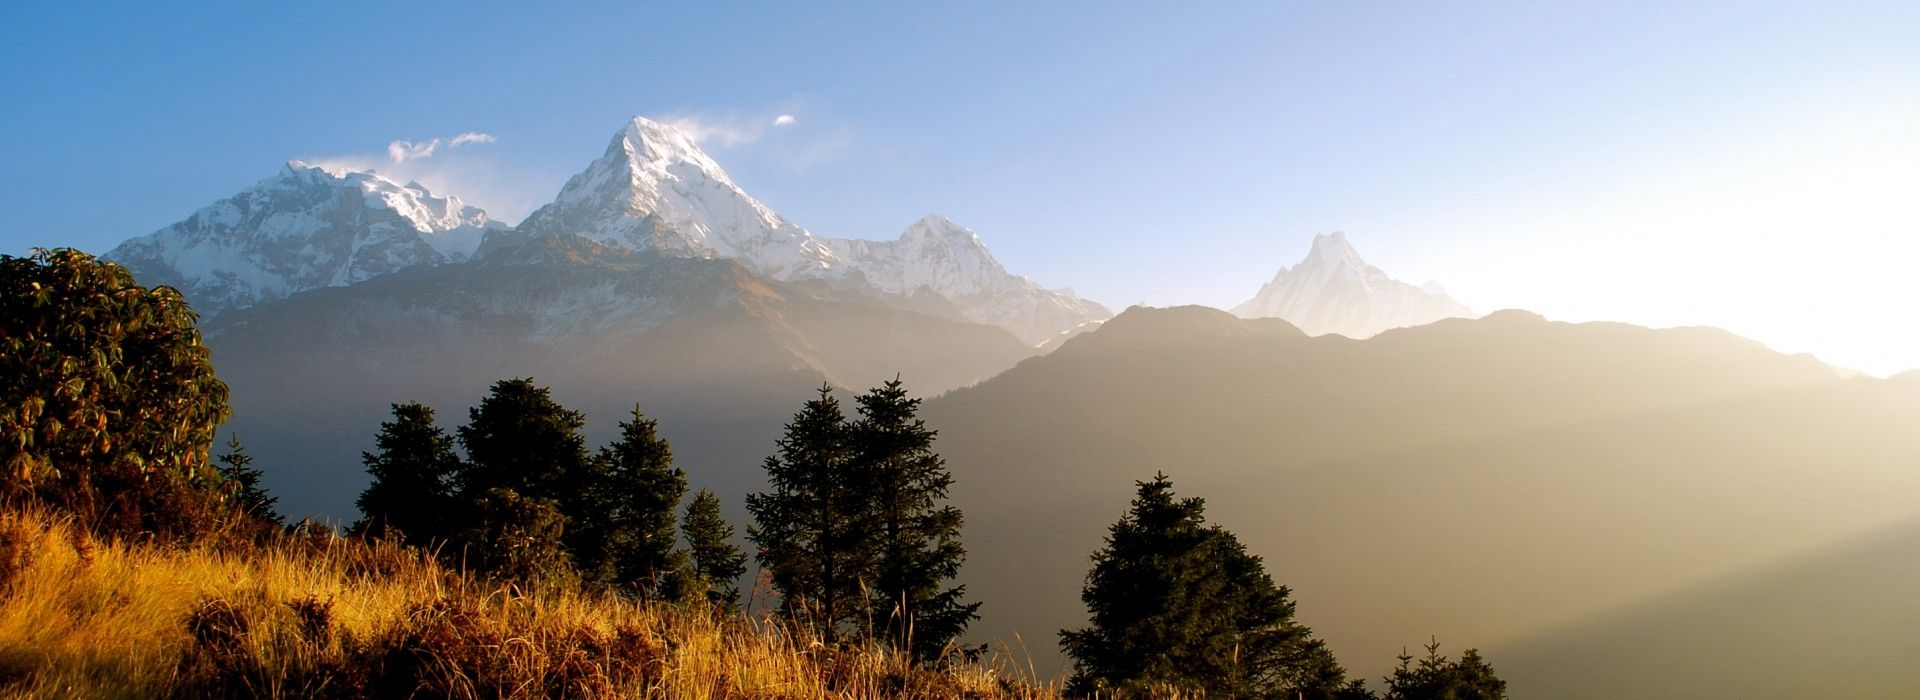 Adventure Tours in Pokhara